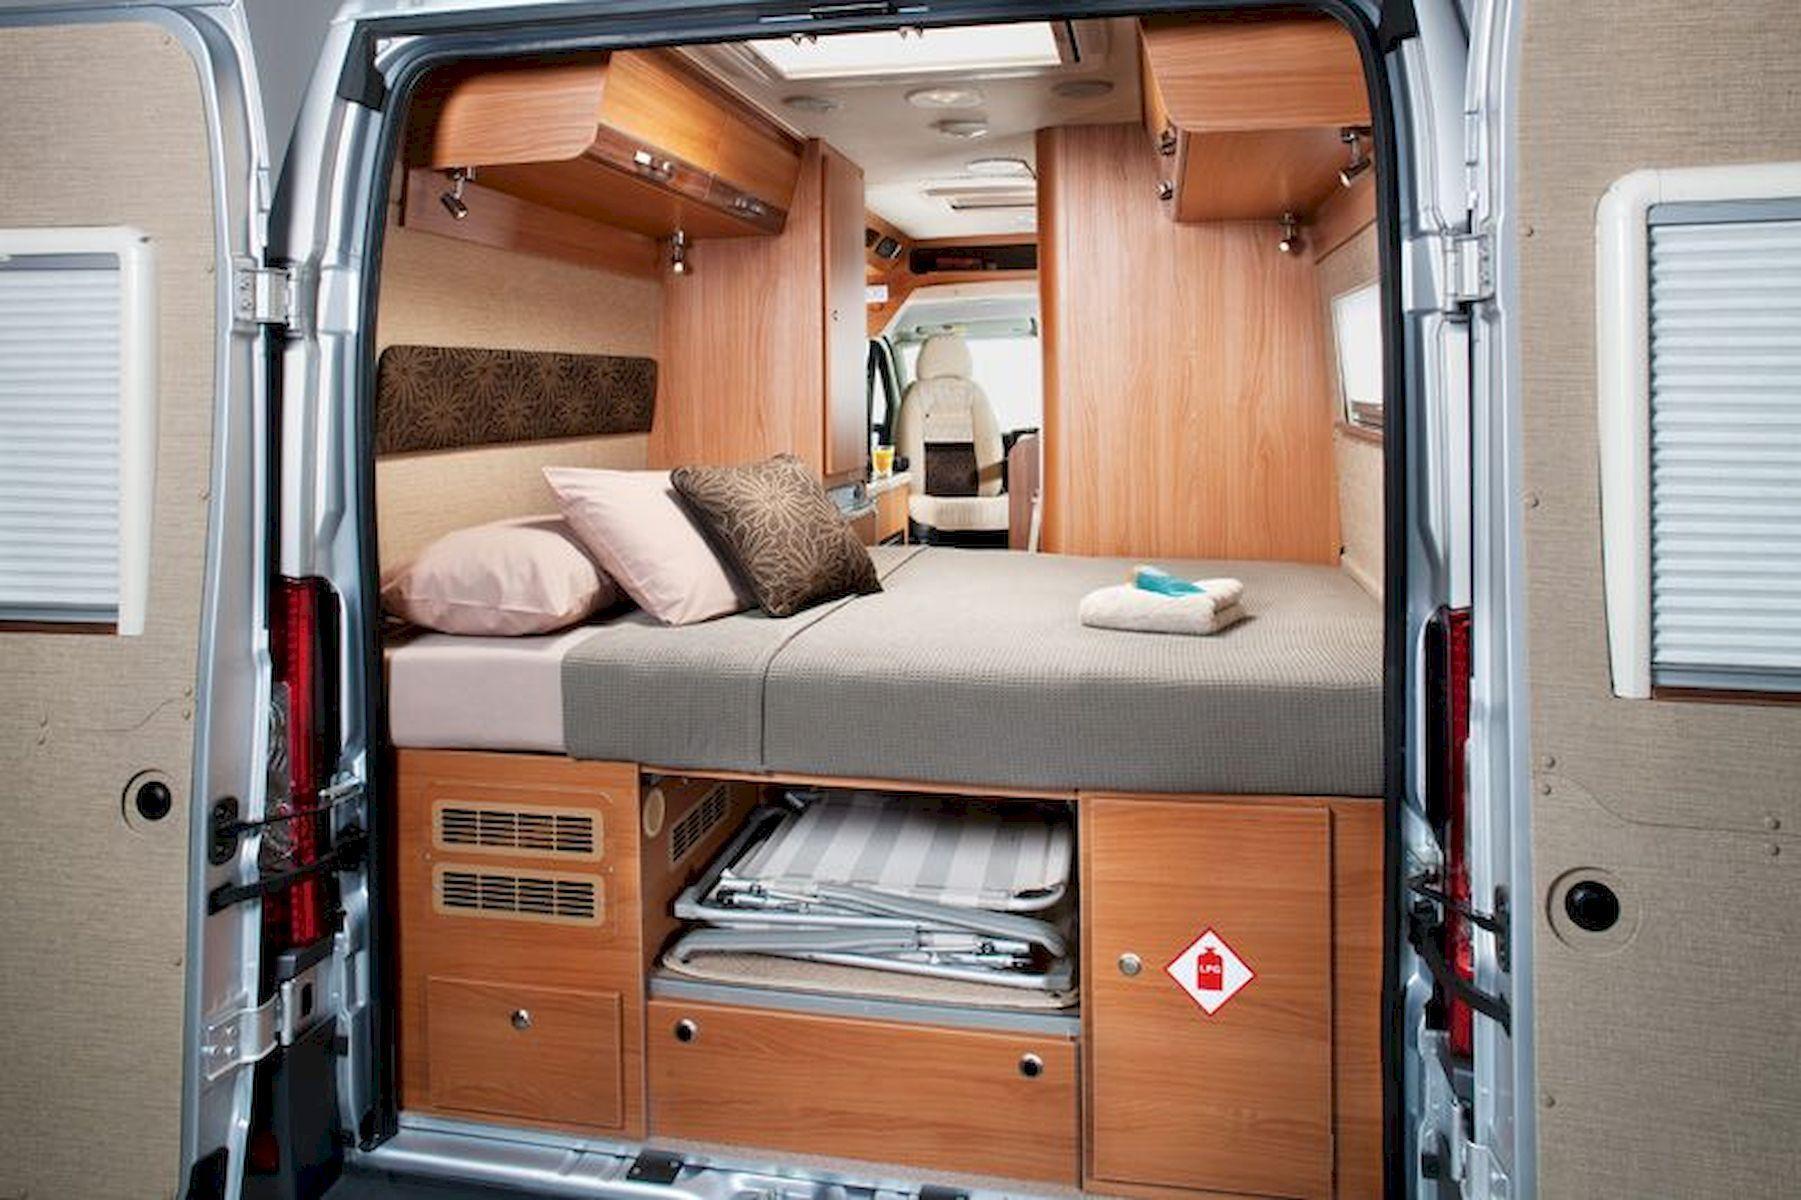 The Perfect Way Campervan Interior Design Ideas (65